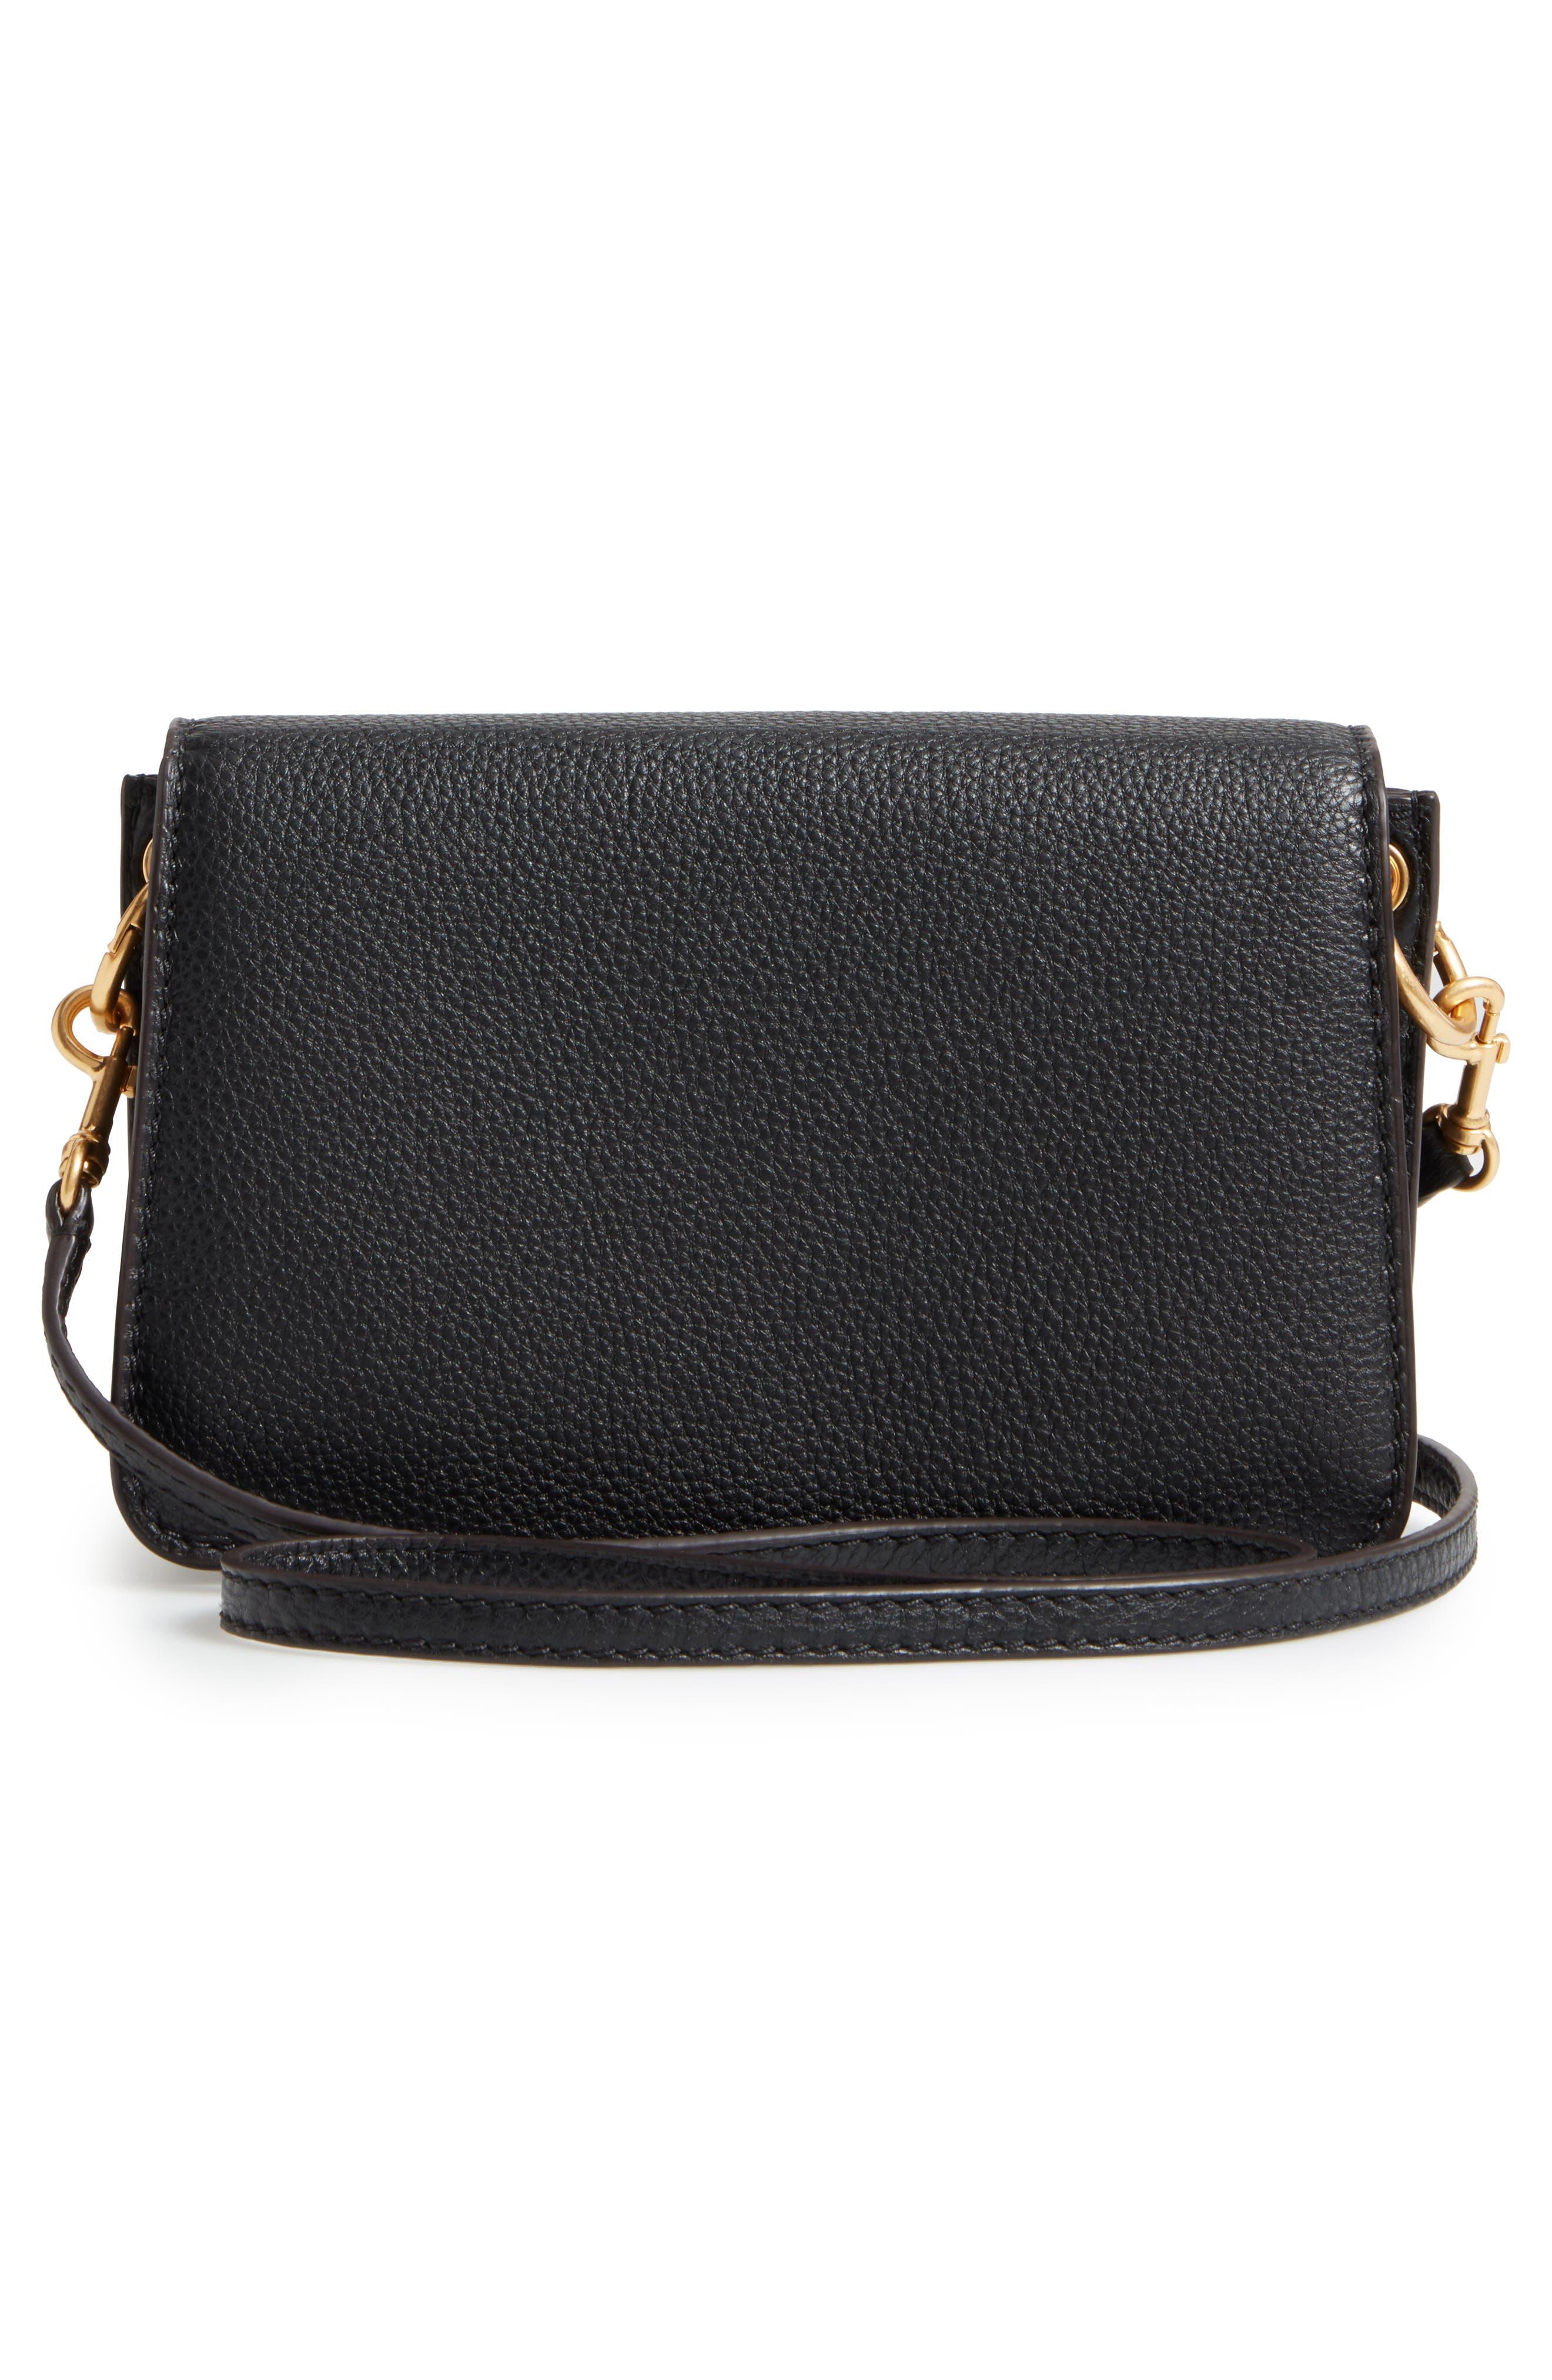 McGraw Leather Shoulder Bag,                             Alternate thumbnail 3, color,                             001